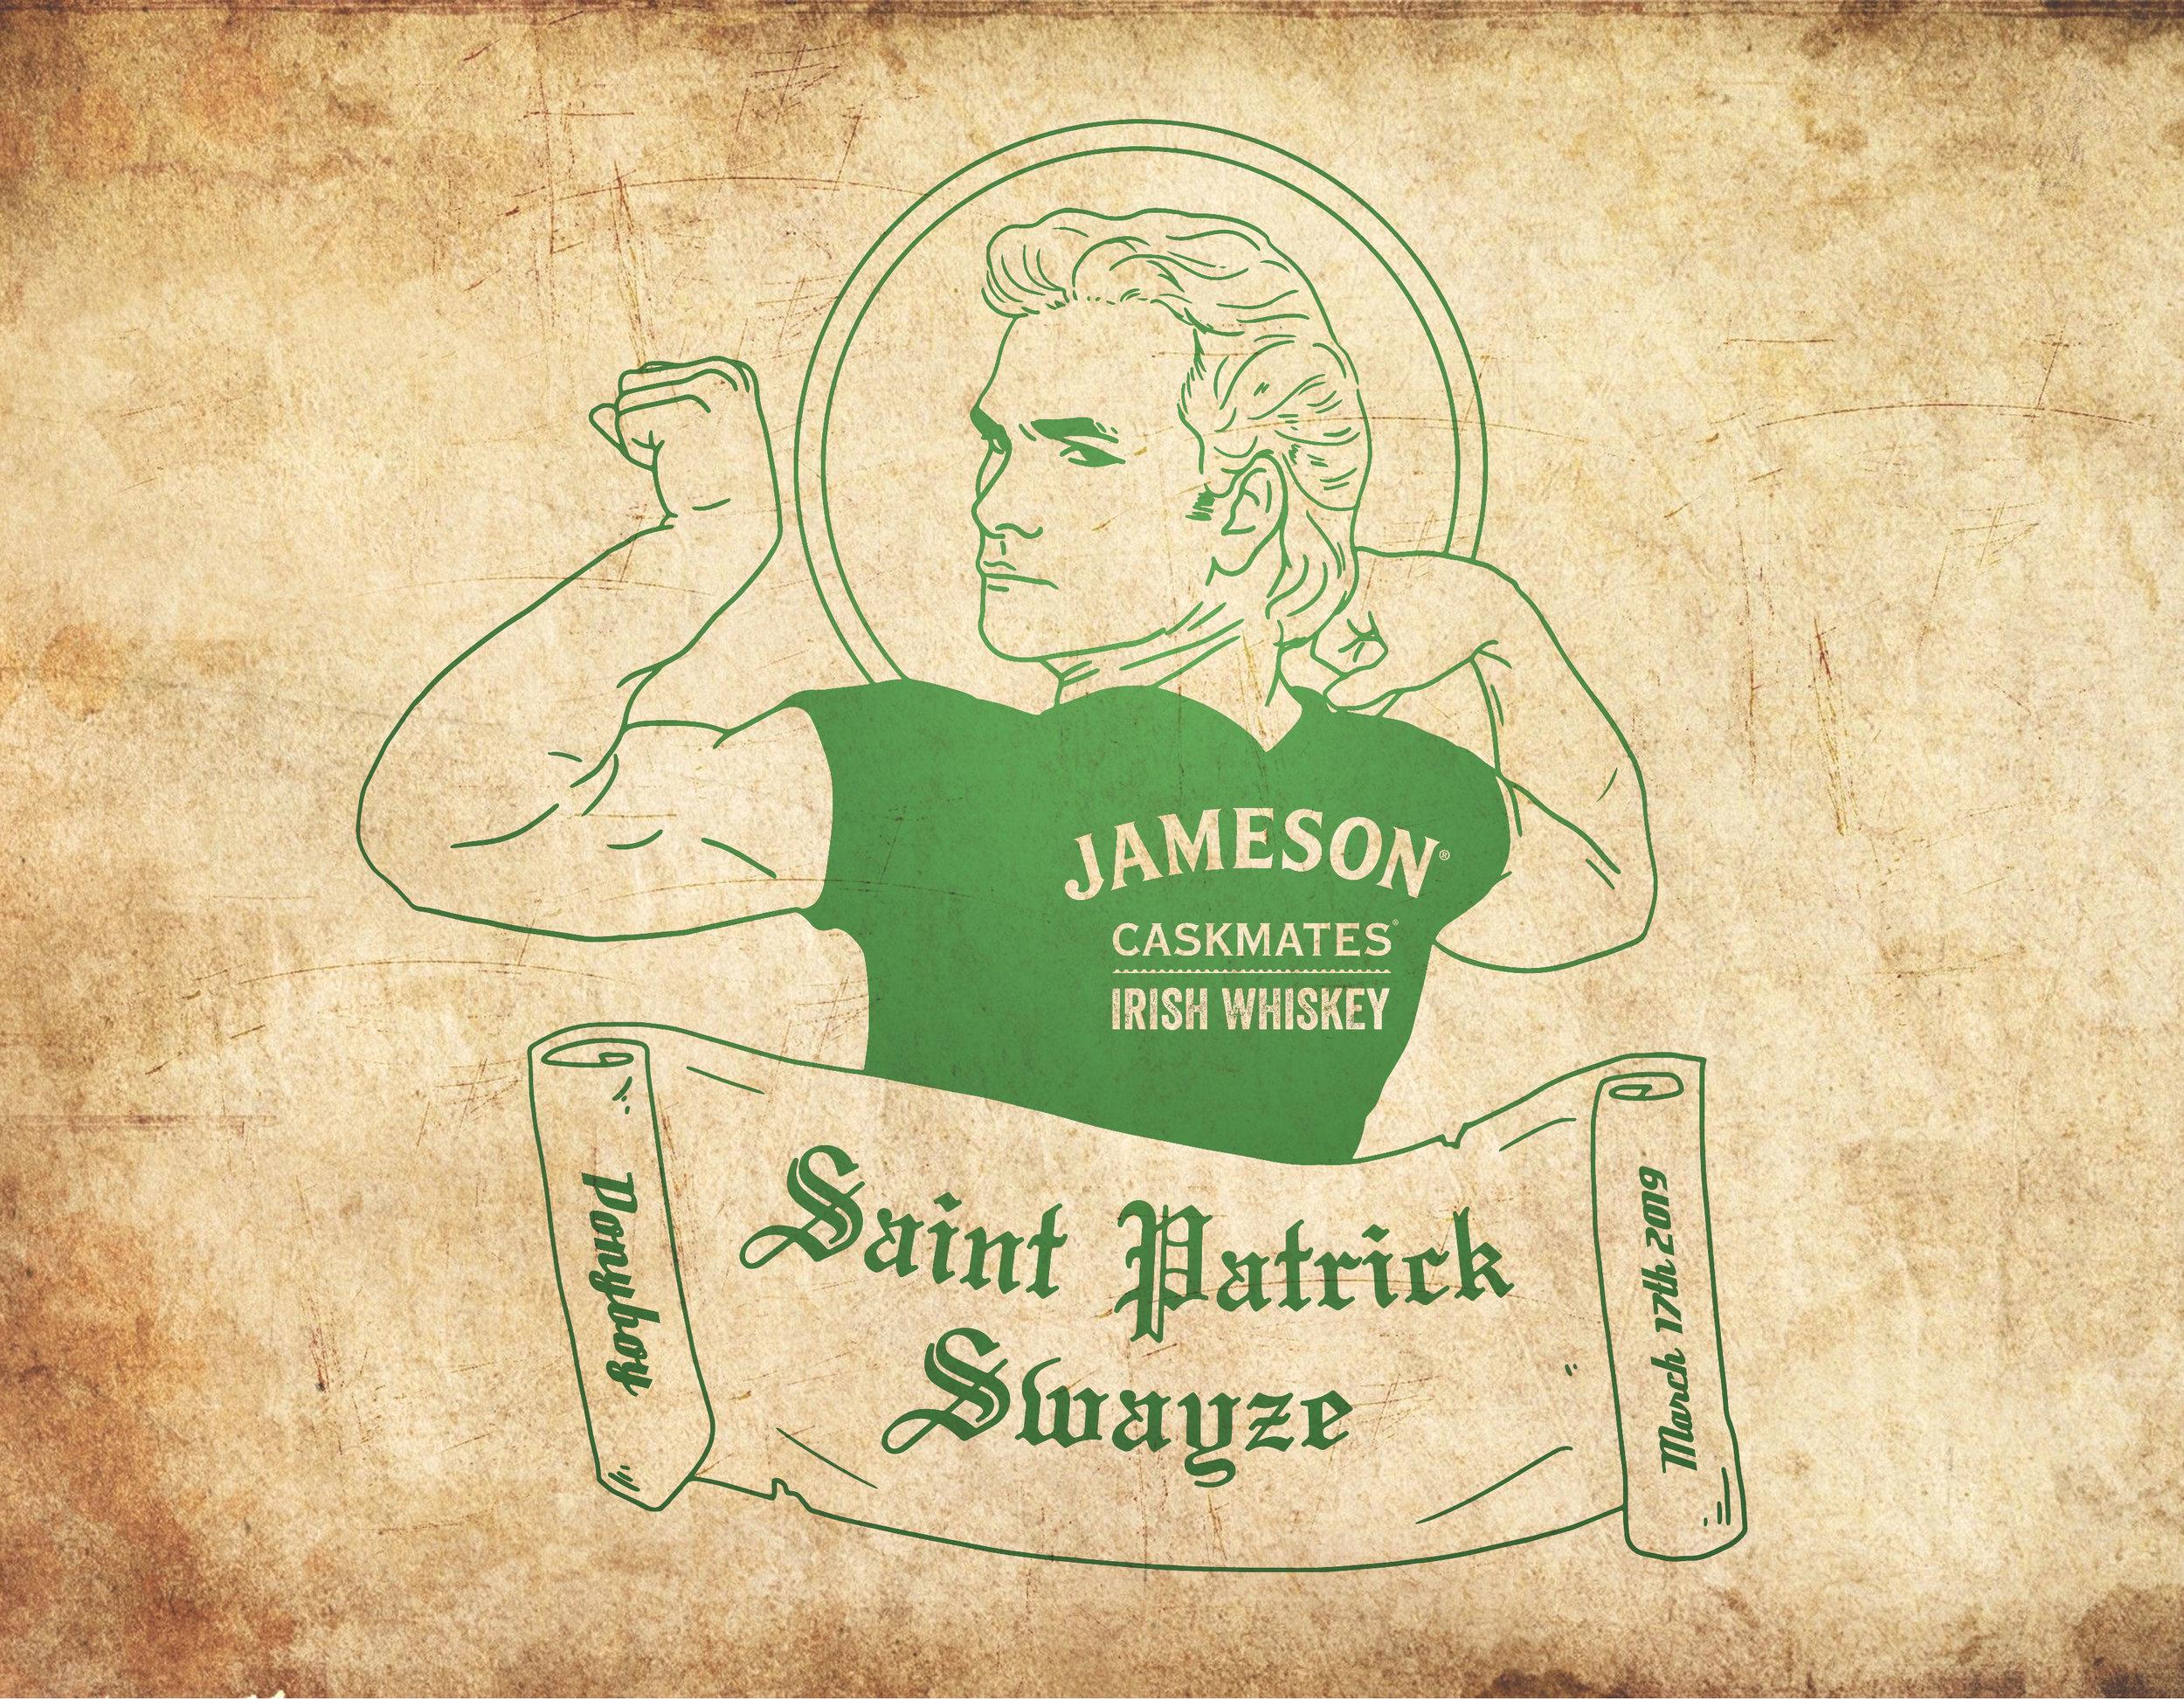 Saint-Patrick-Swayze-2019-Social-Image.jpg